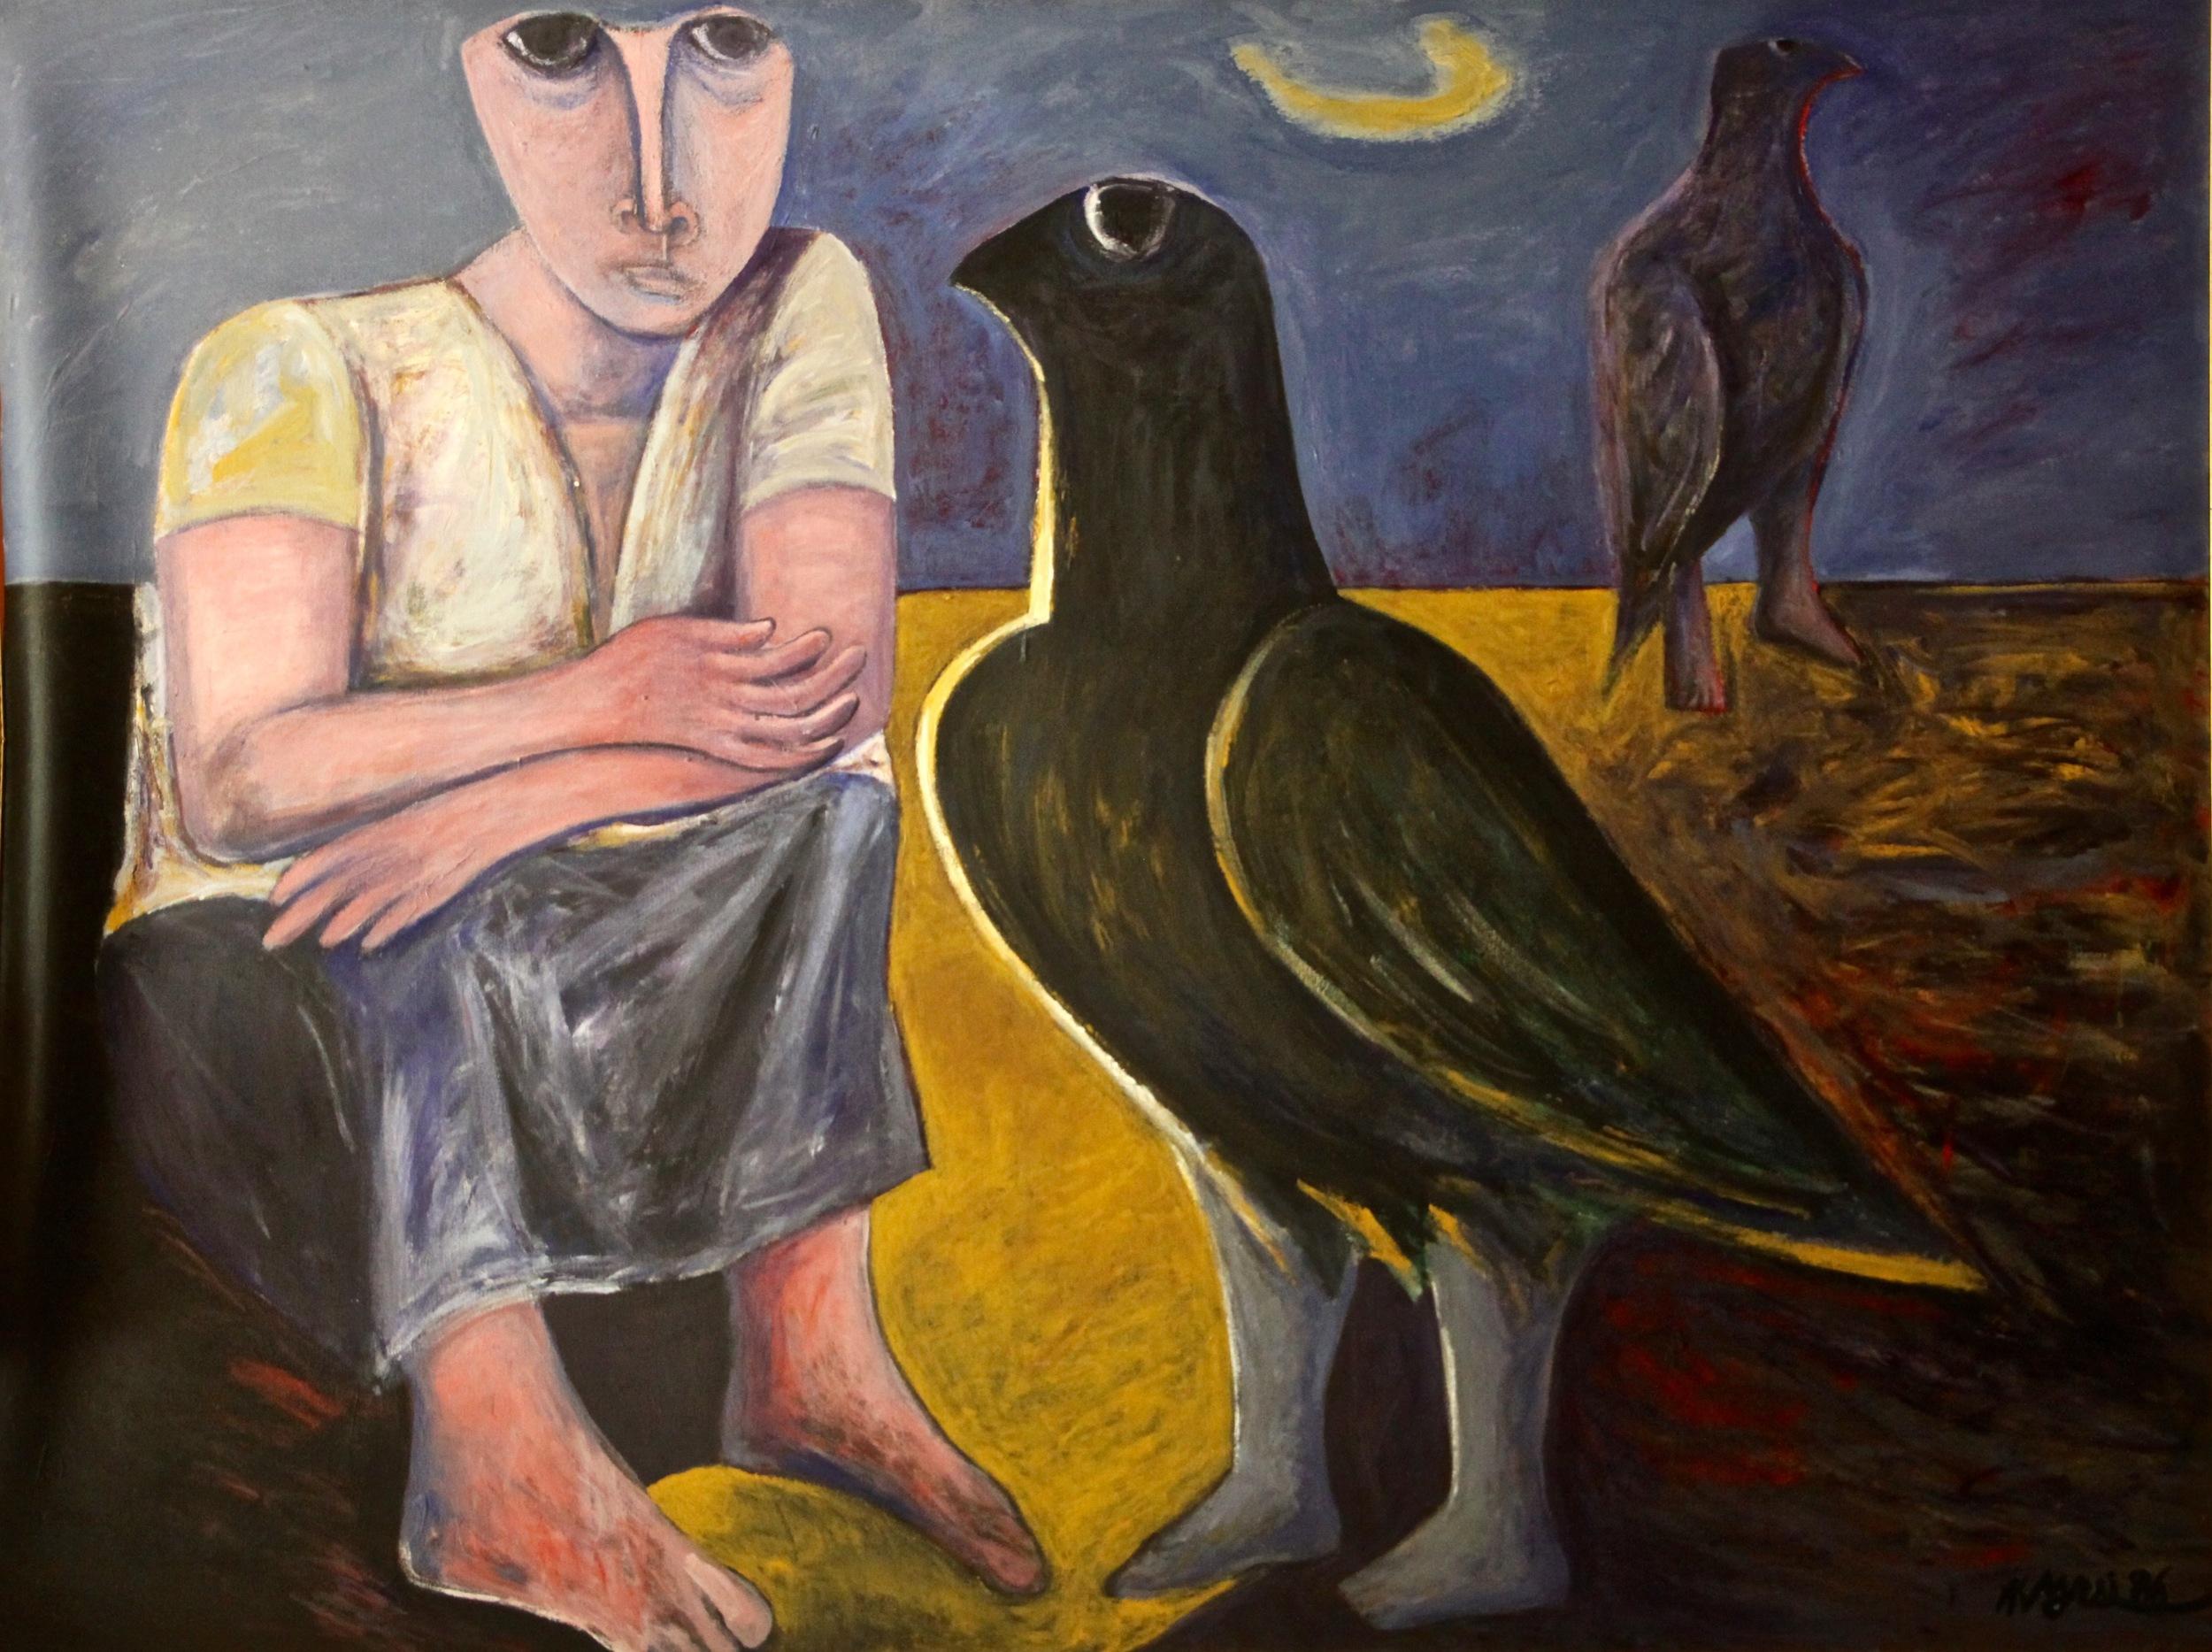 Ahmed Morsi,Black Bird II,1986,Acrylic on canvas,200 x 150 cm.